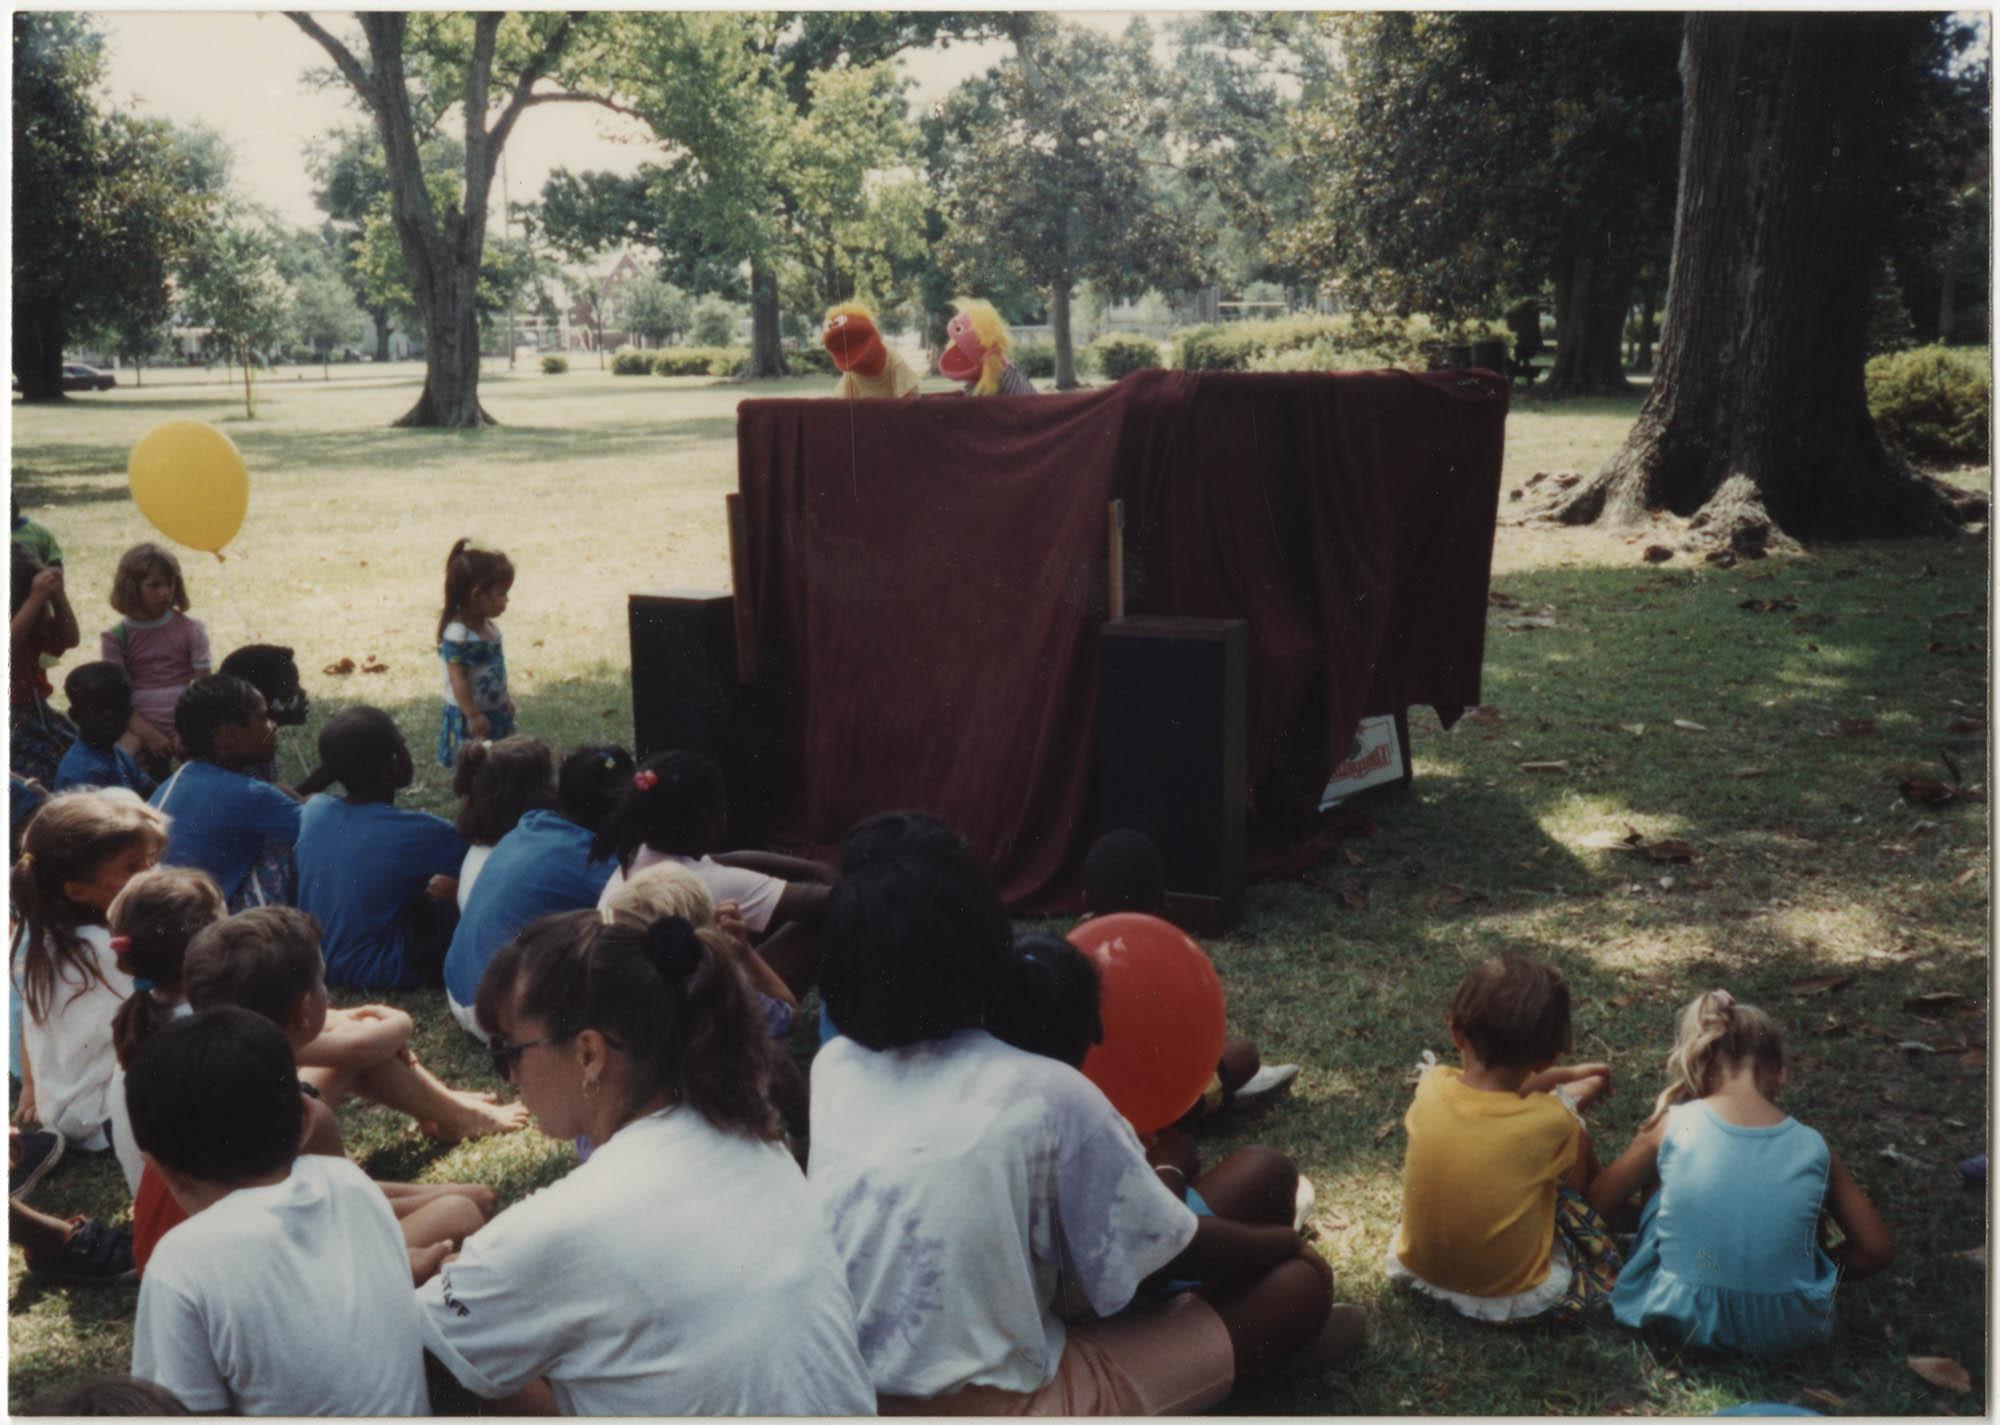 Photograph of a Puppet Show